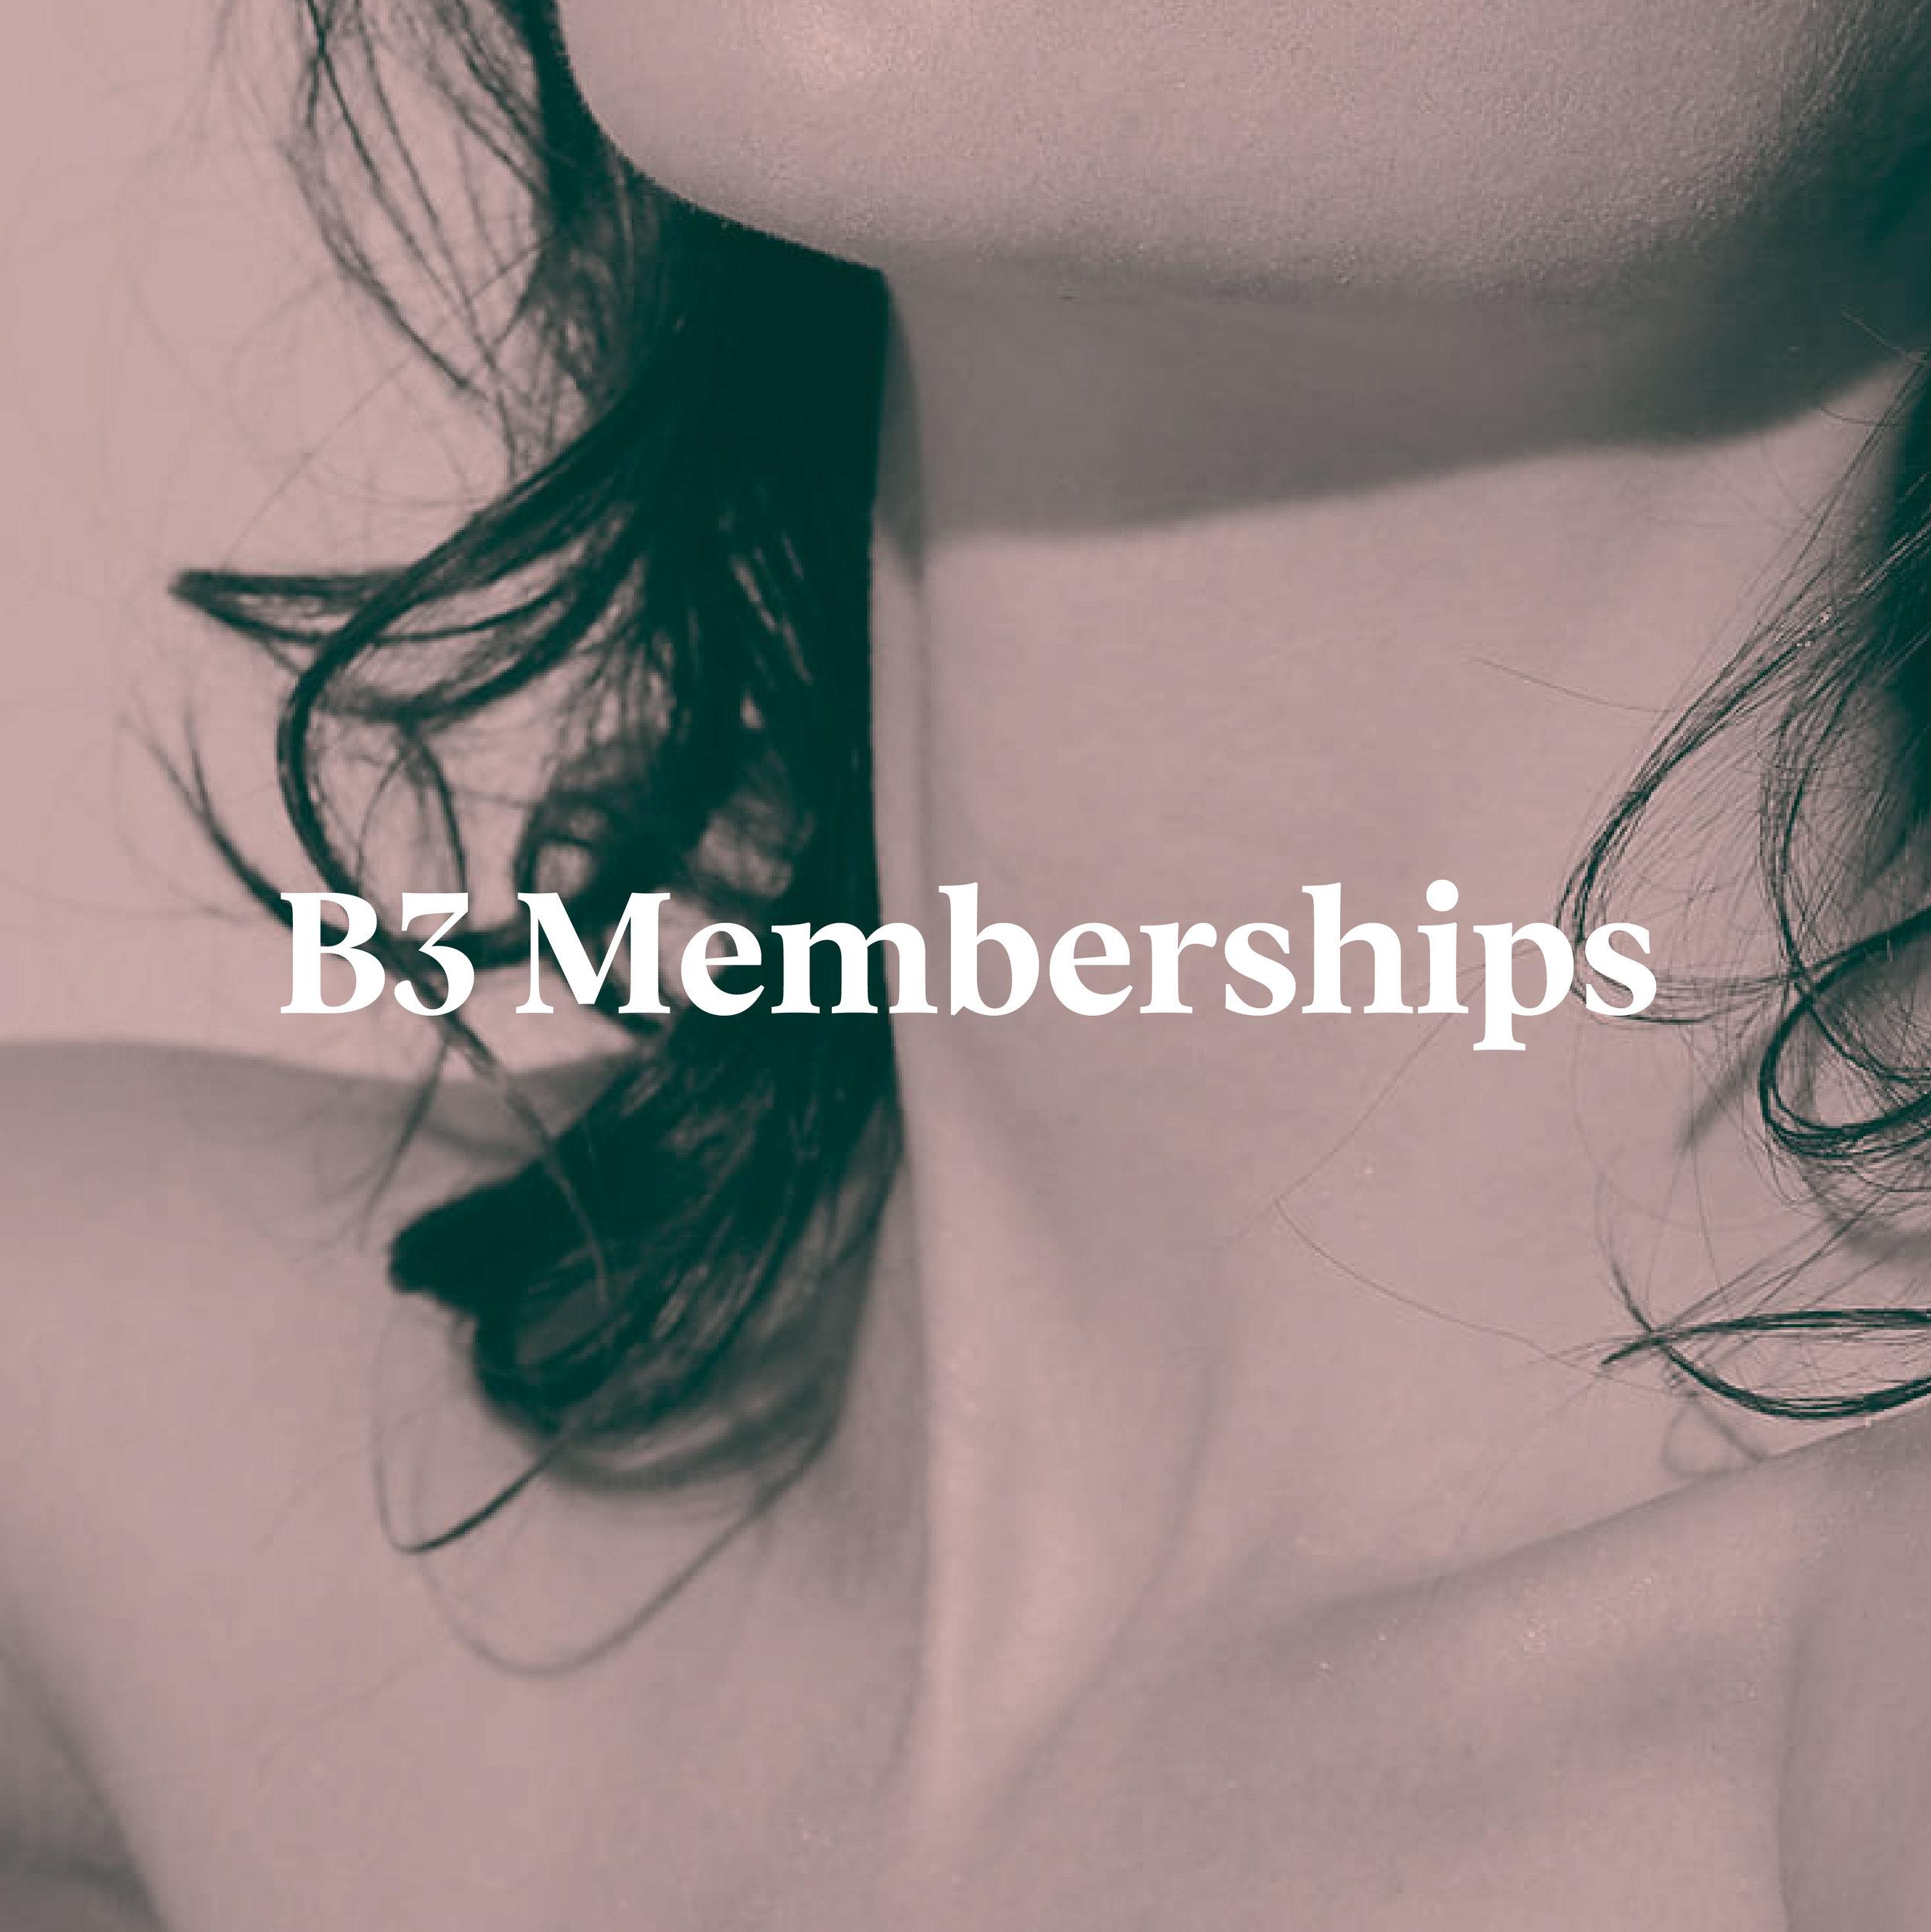 b3_services images-memberships-09.jpg